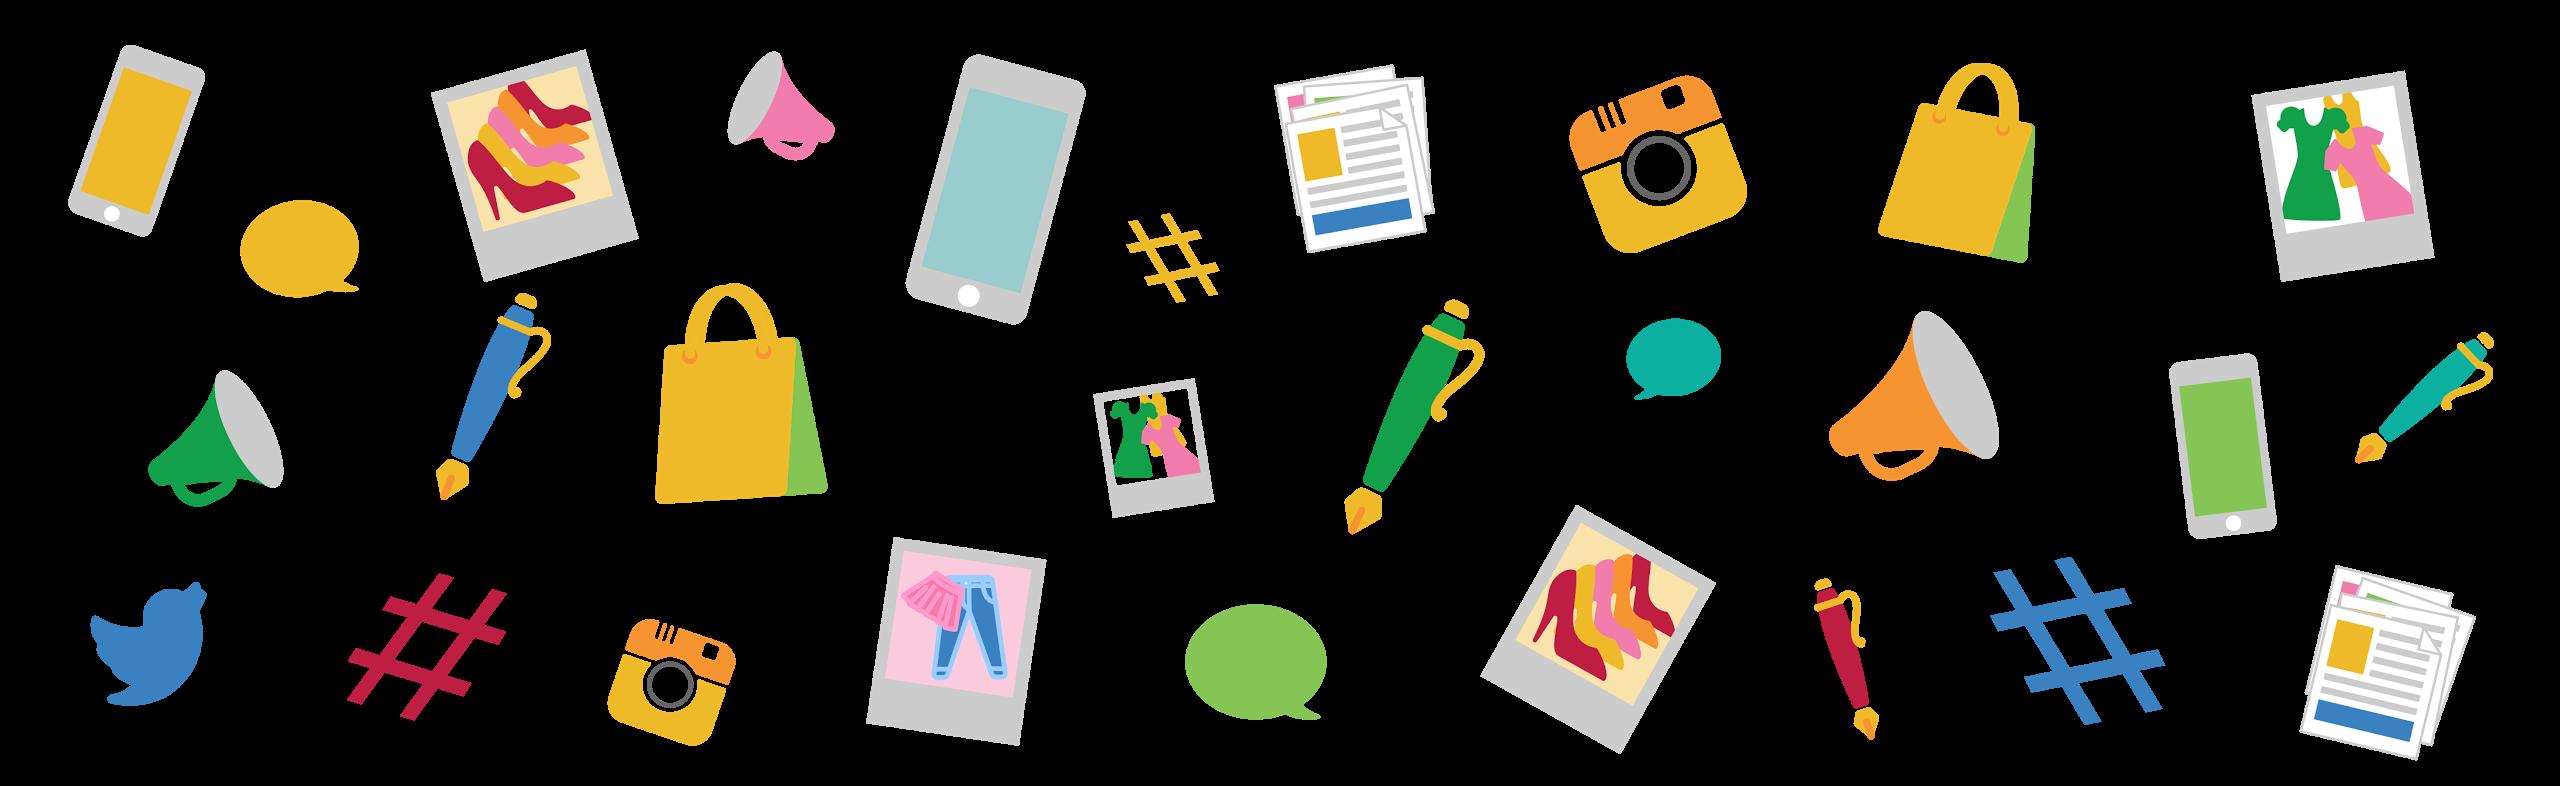 contentblog-leaderimage